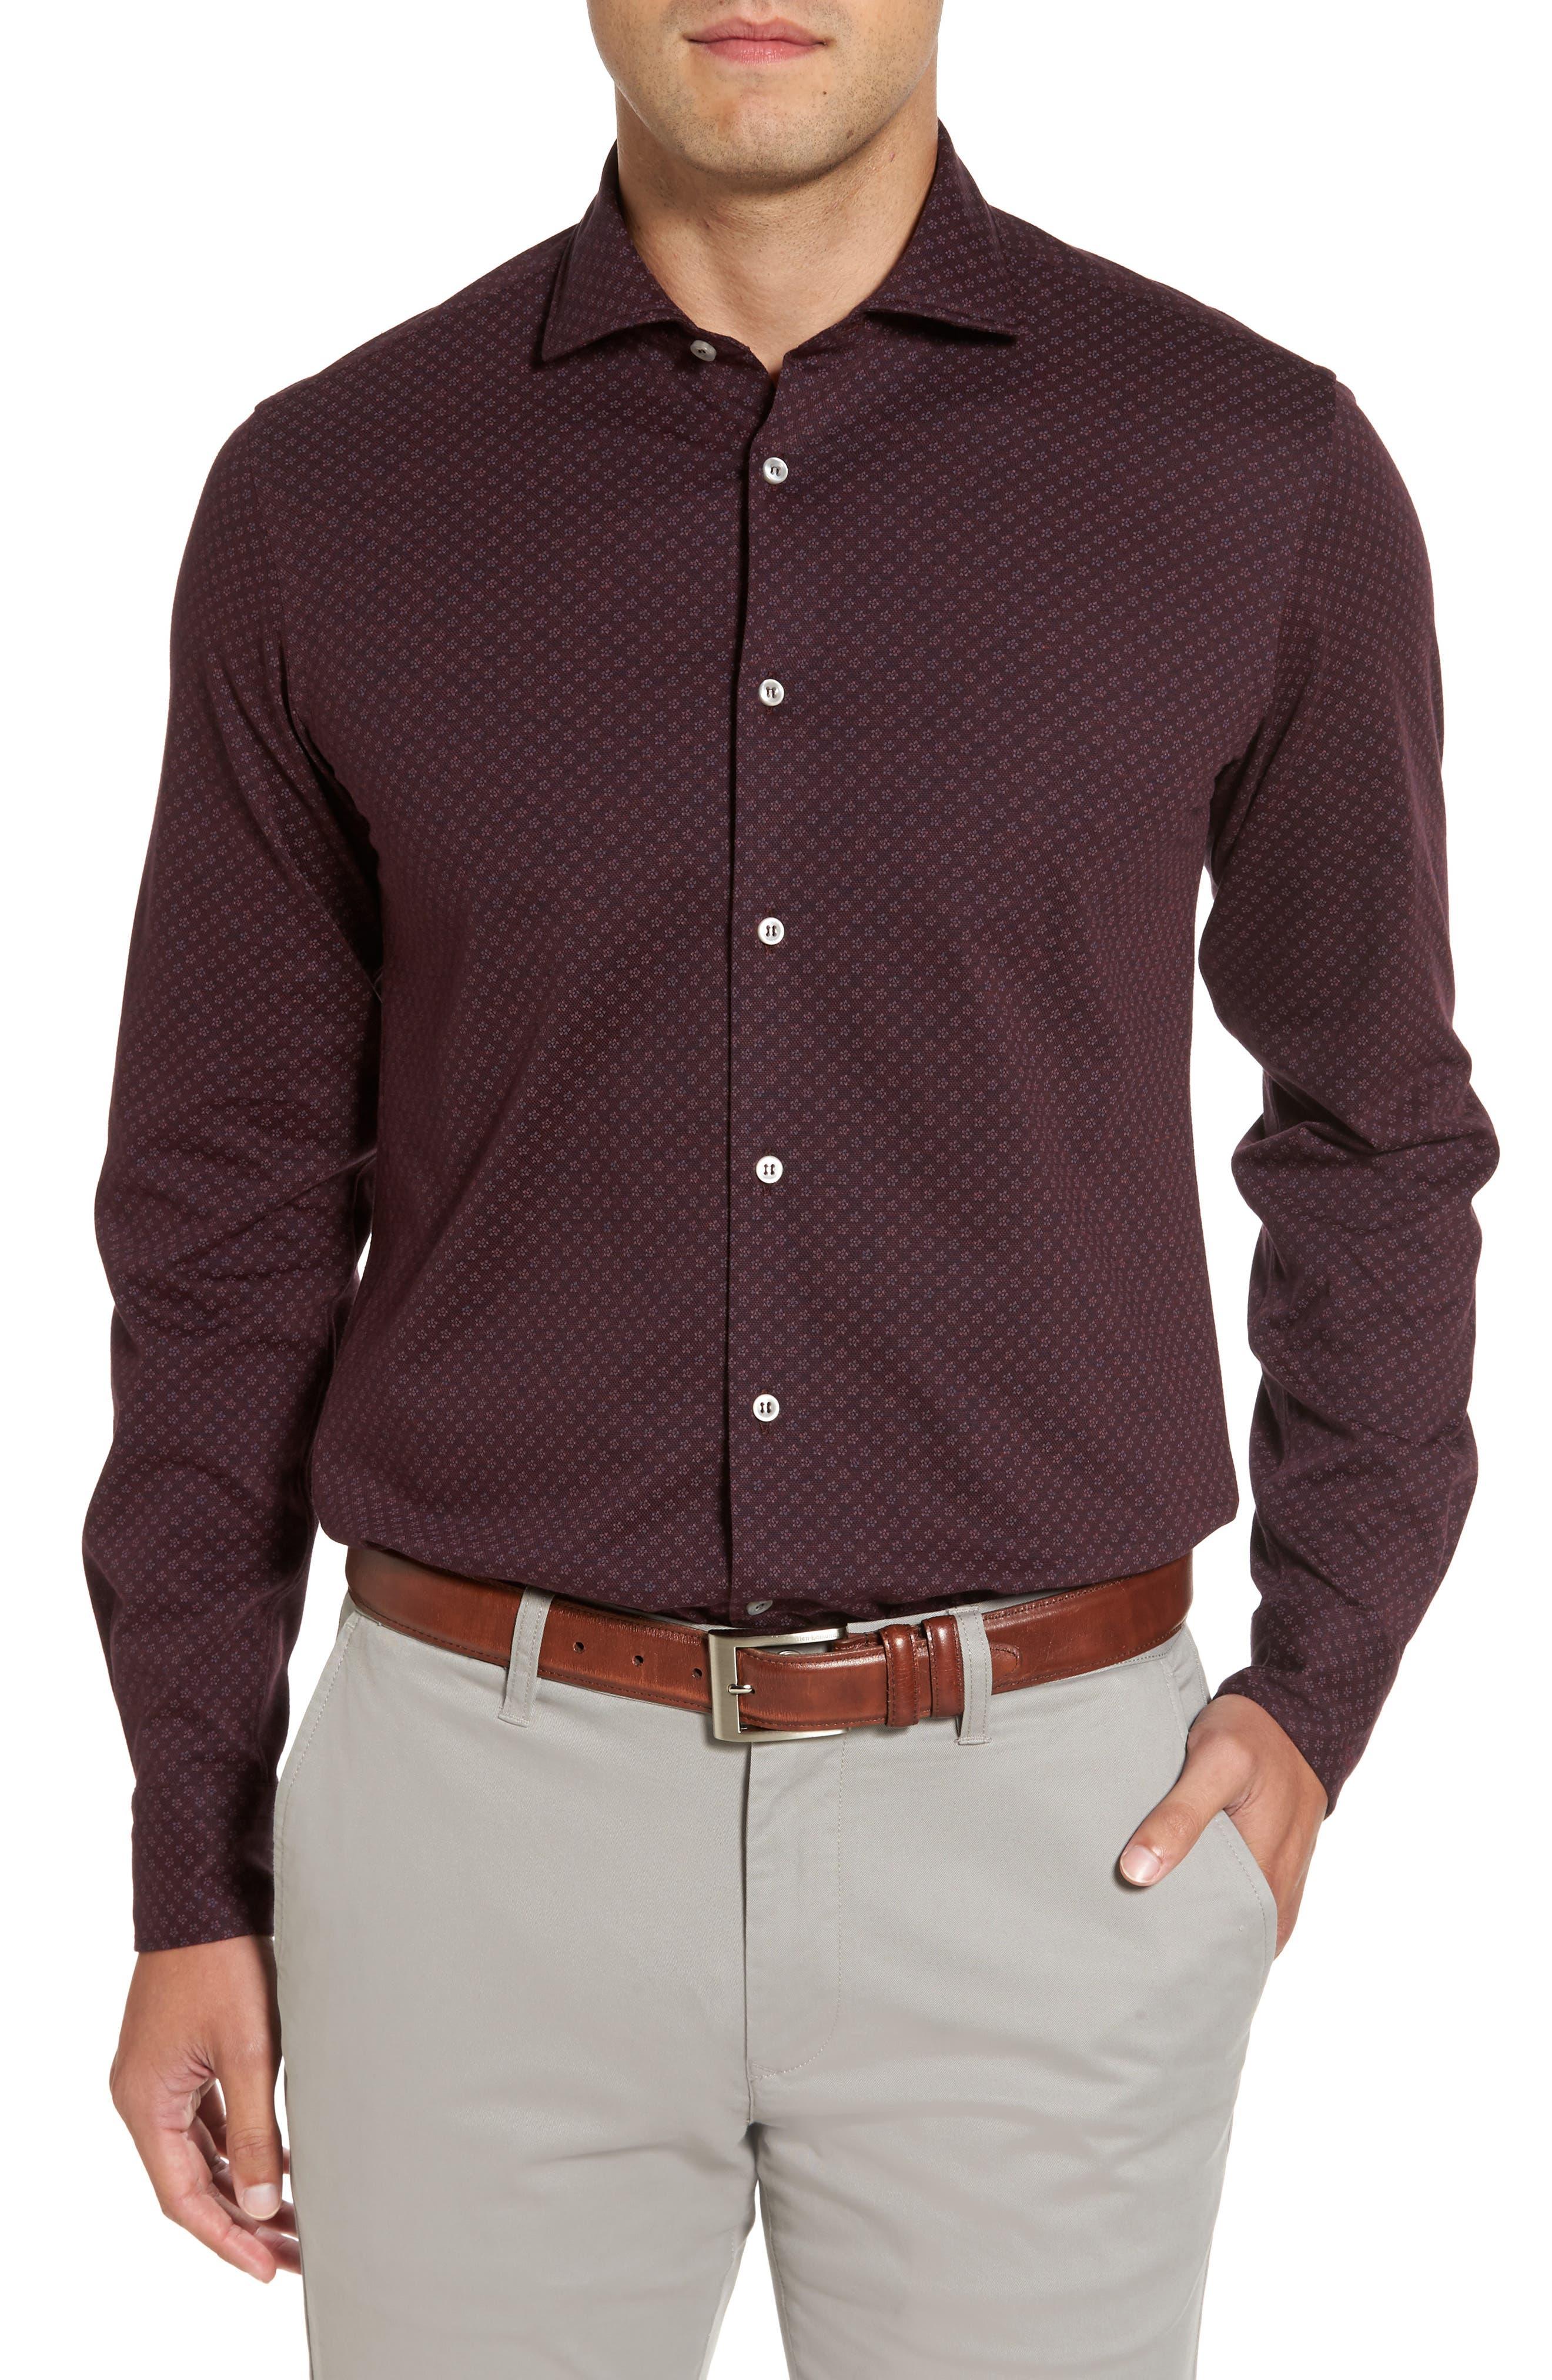 Paul&Shark Floral Print Knit Sports Shirt,                         Main,                         color, 930